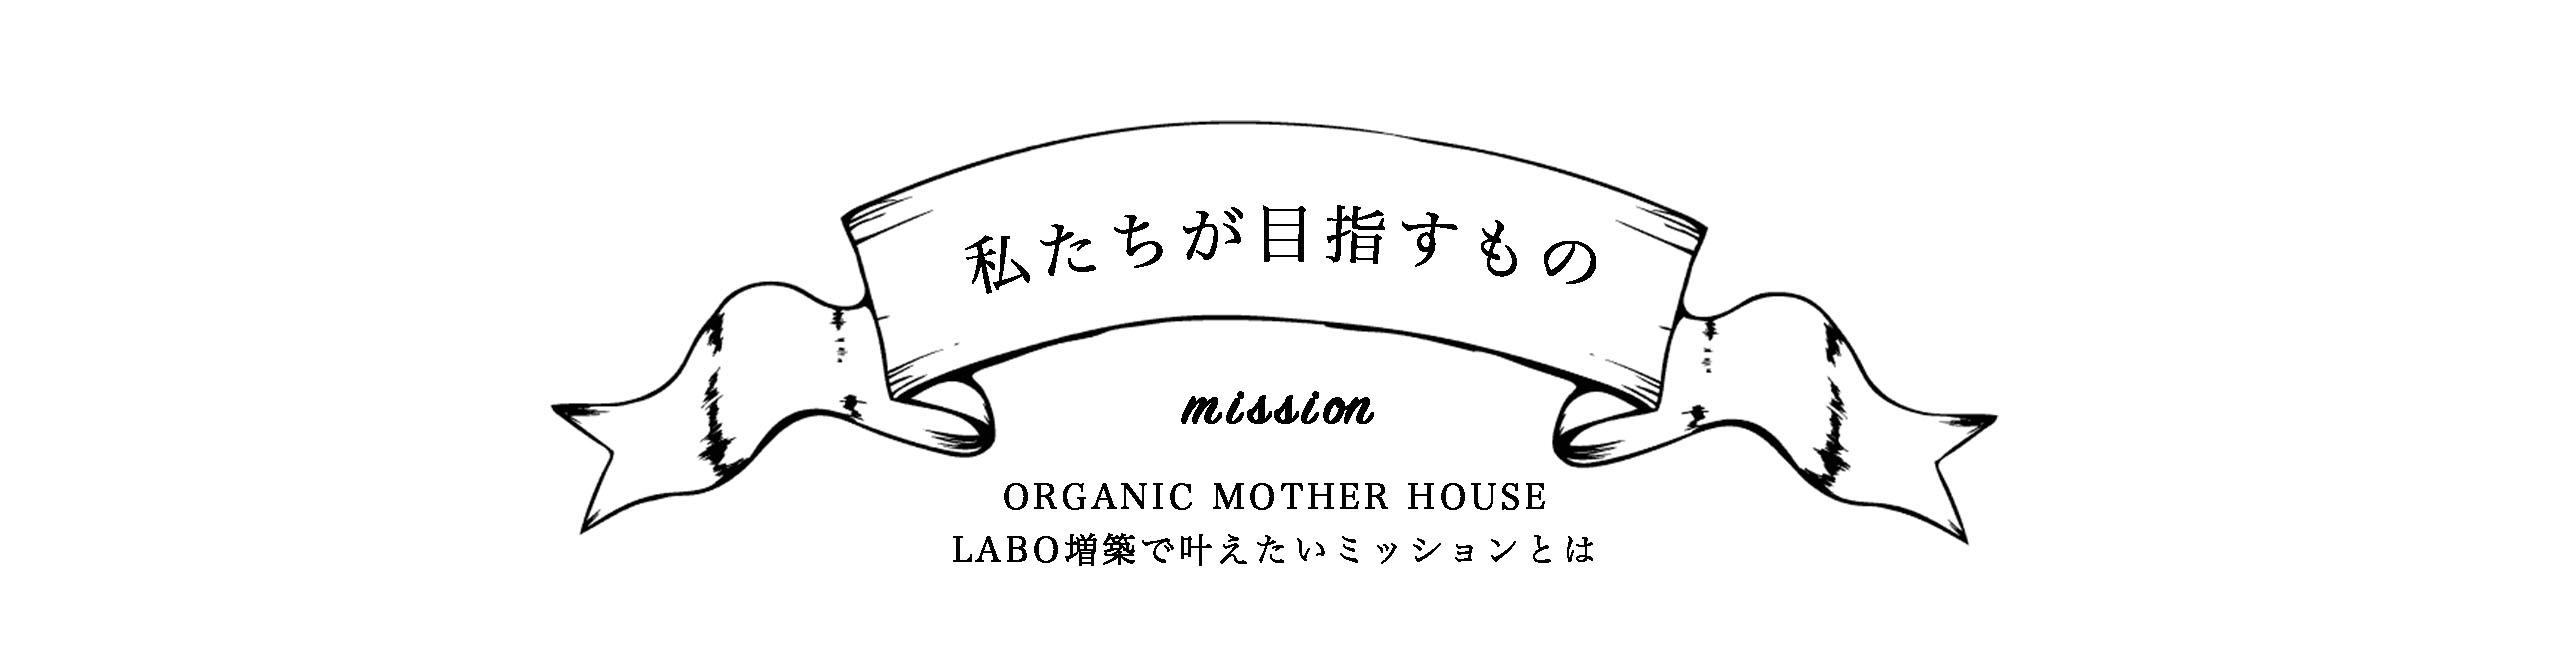 ORGANIC MOTHER HOUSE〈植物調合美容研究所〉ミッション